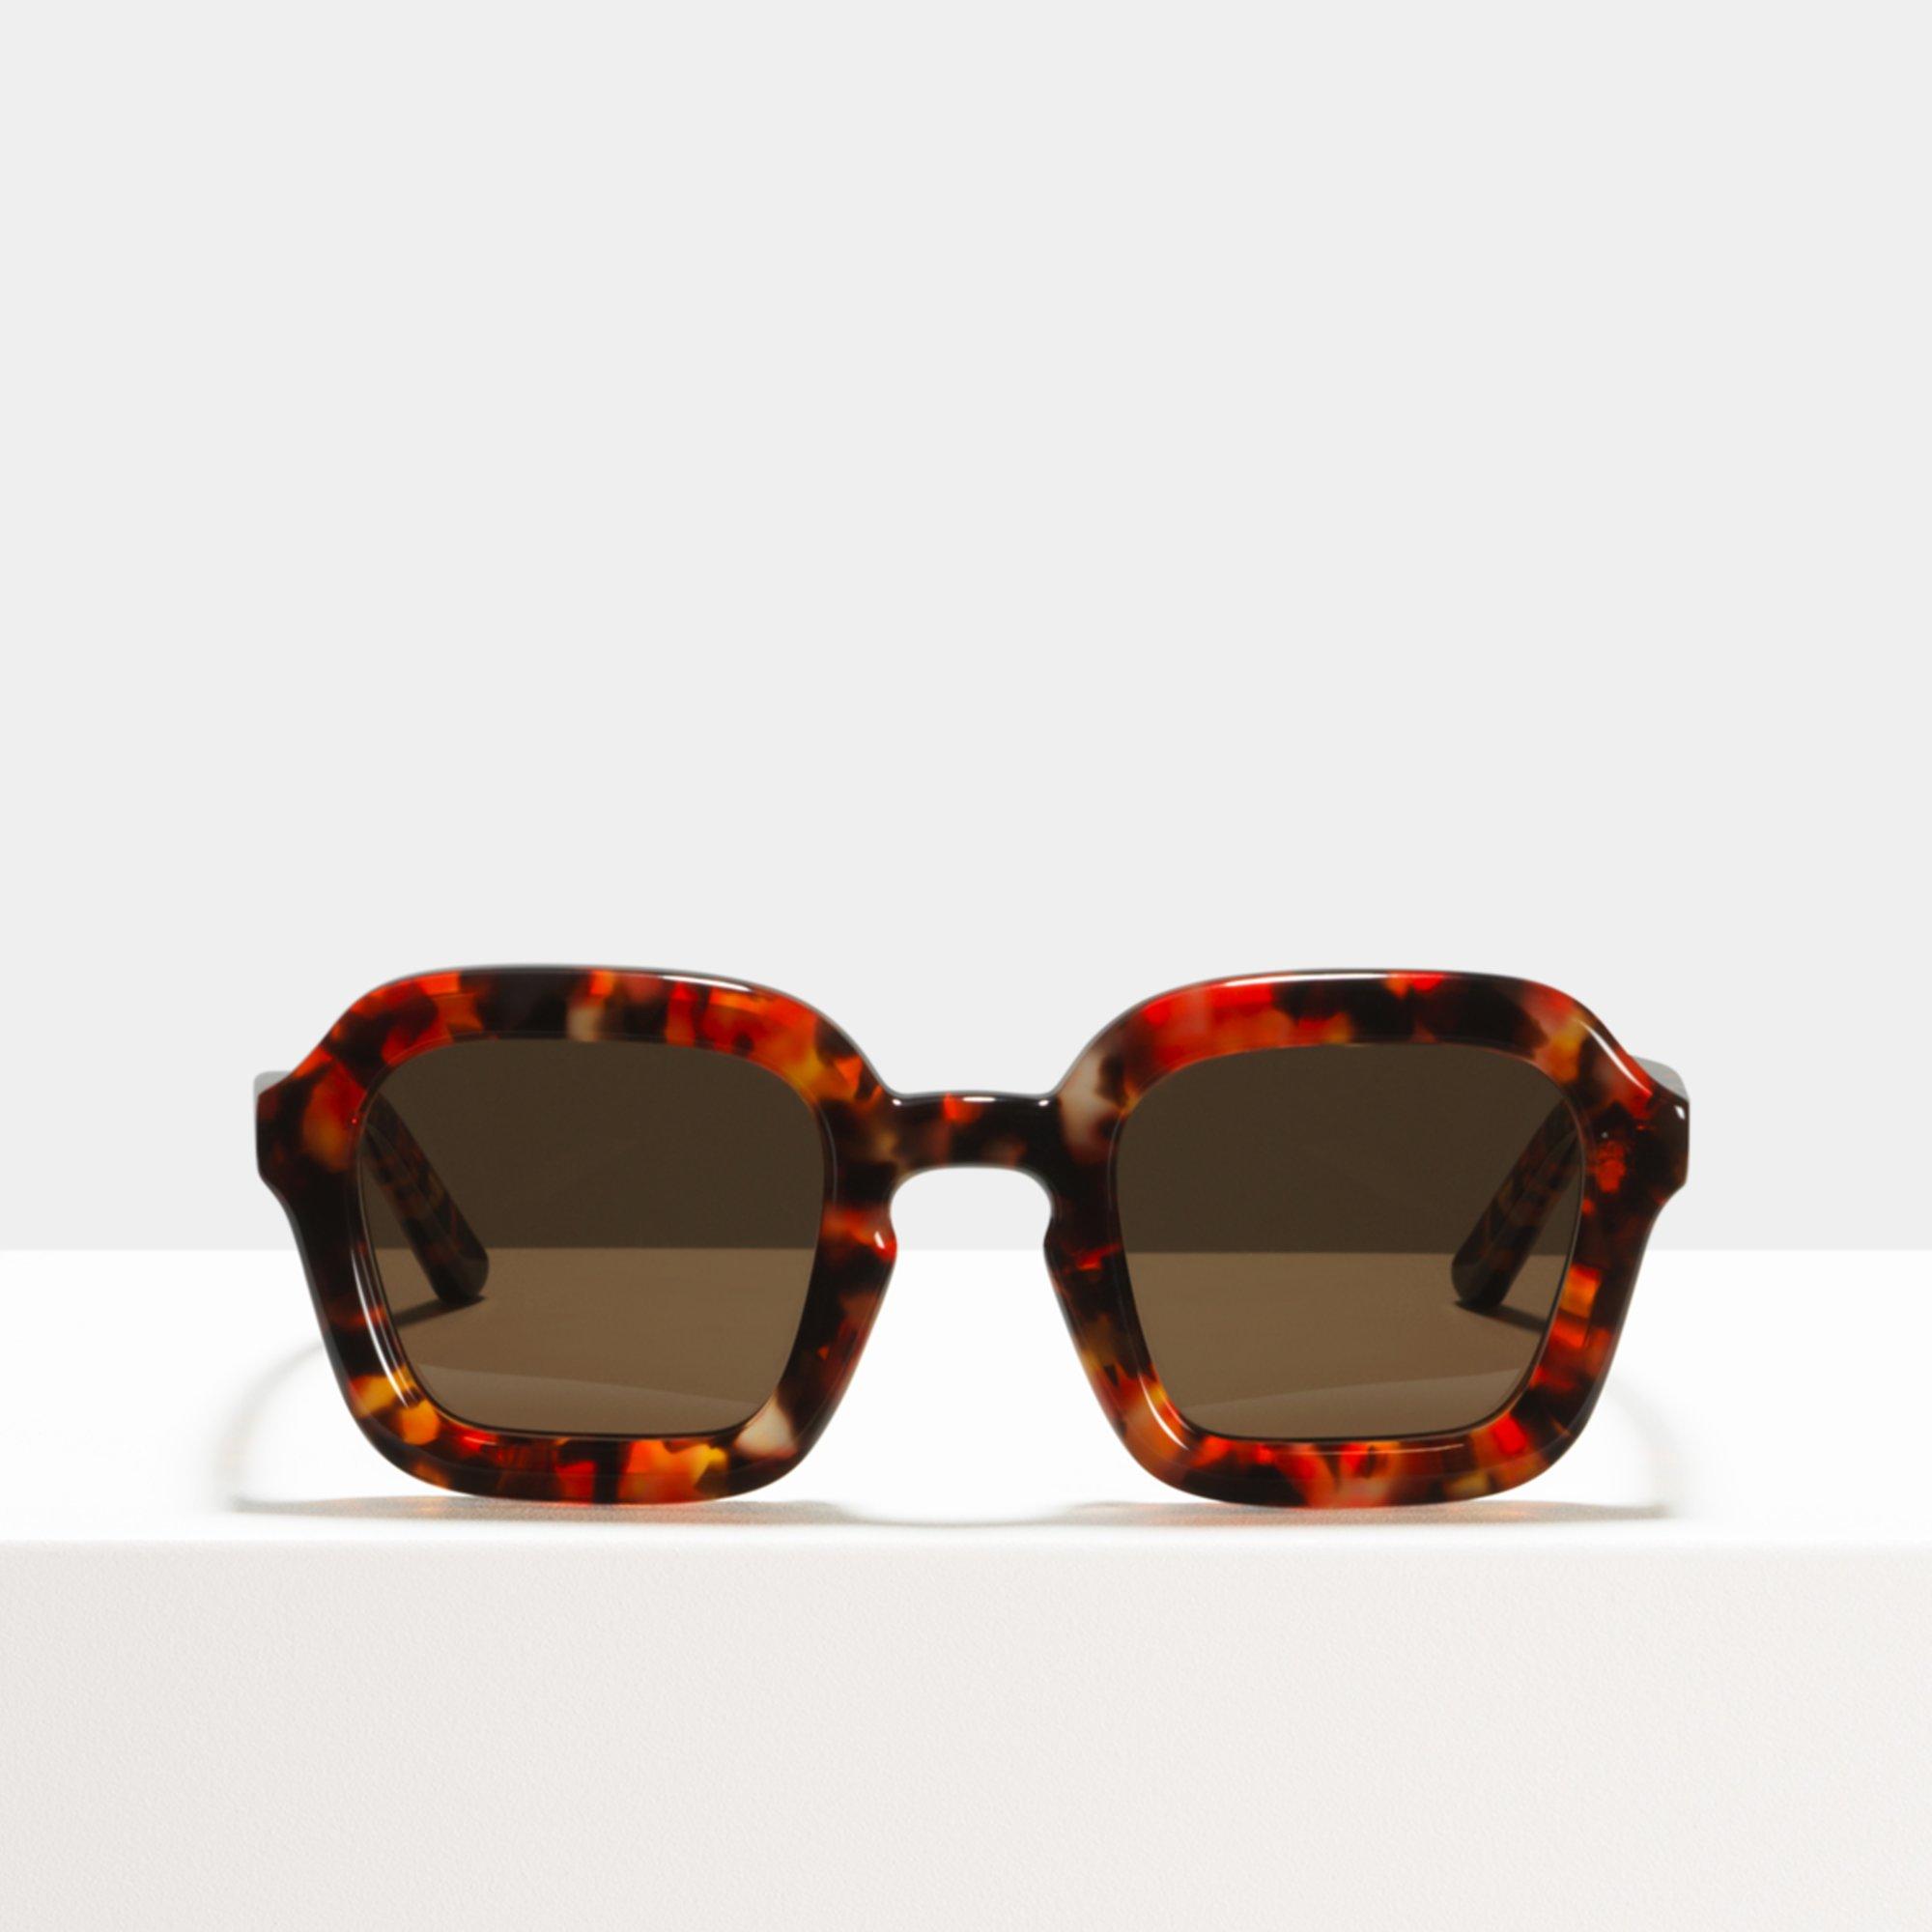 Ace & Tate Sunglasses | square acetate in Orange, Red